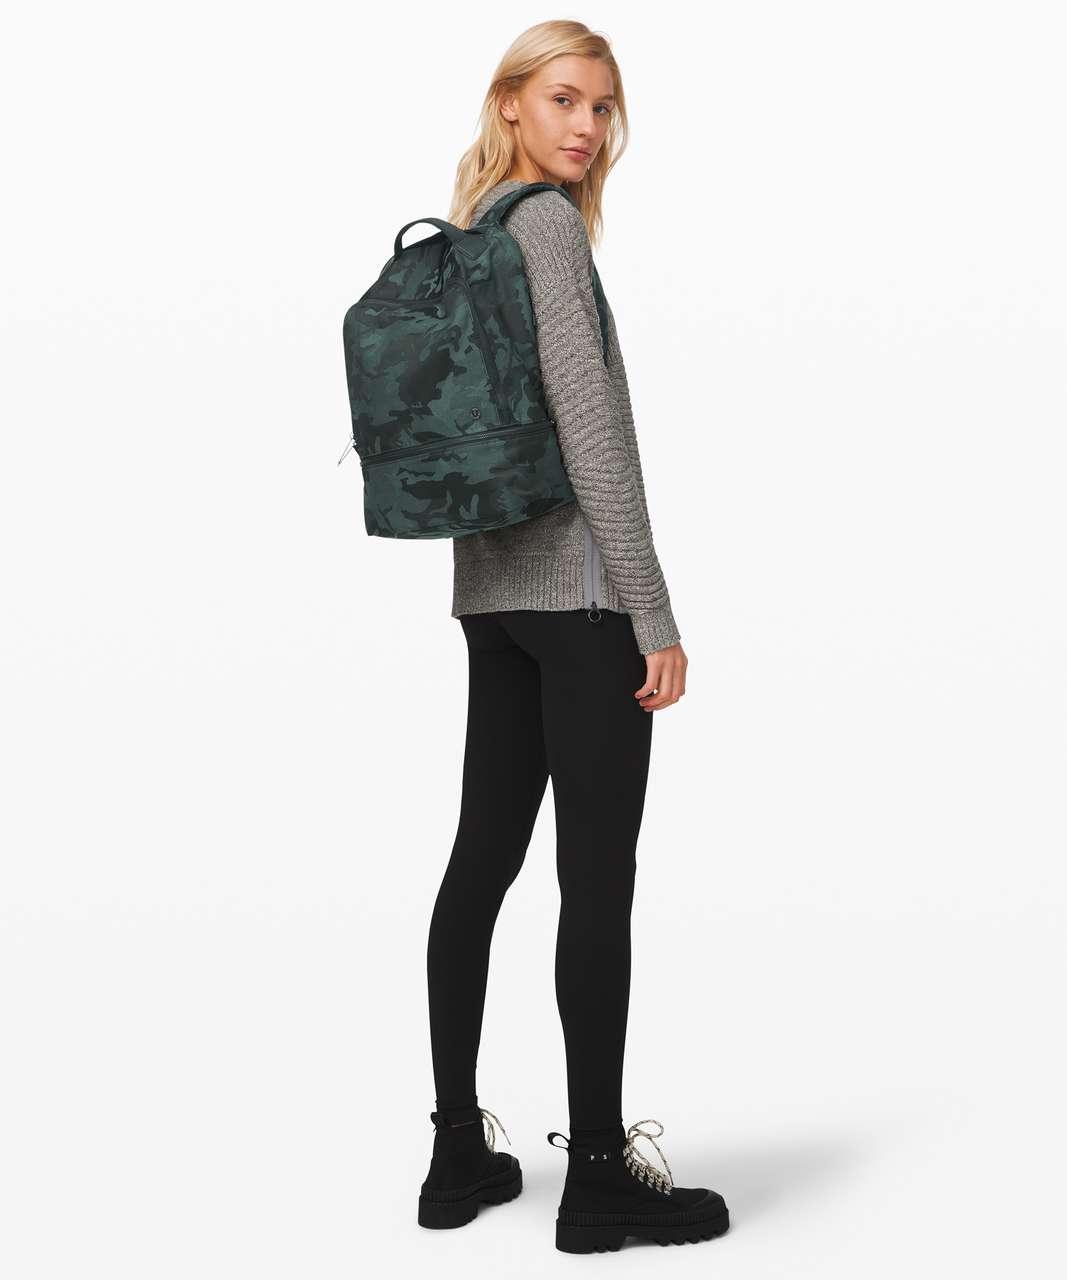 Lululemon City Adventurer Backpack *17L - Jacquard Camo Cotton Obsidian / Black